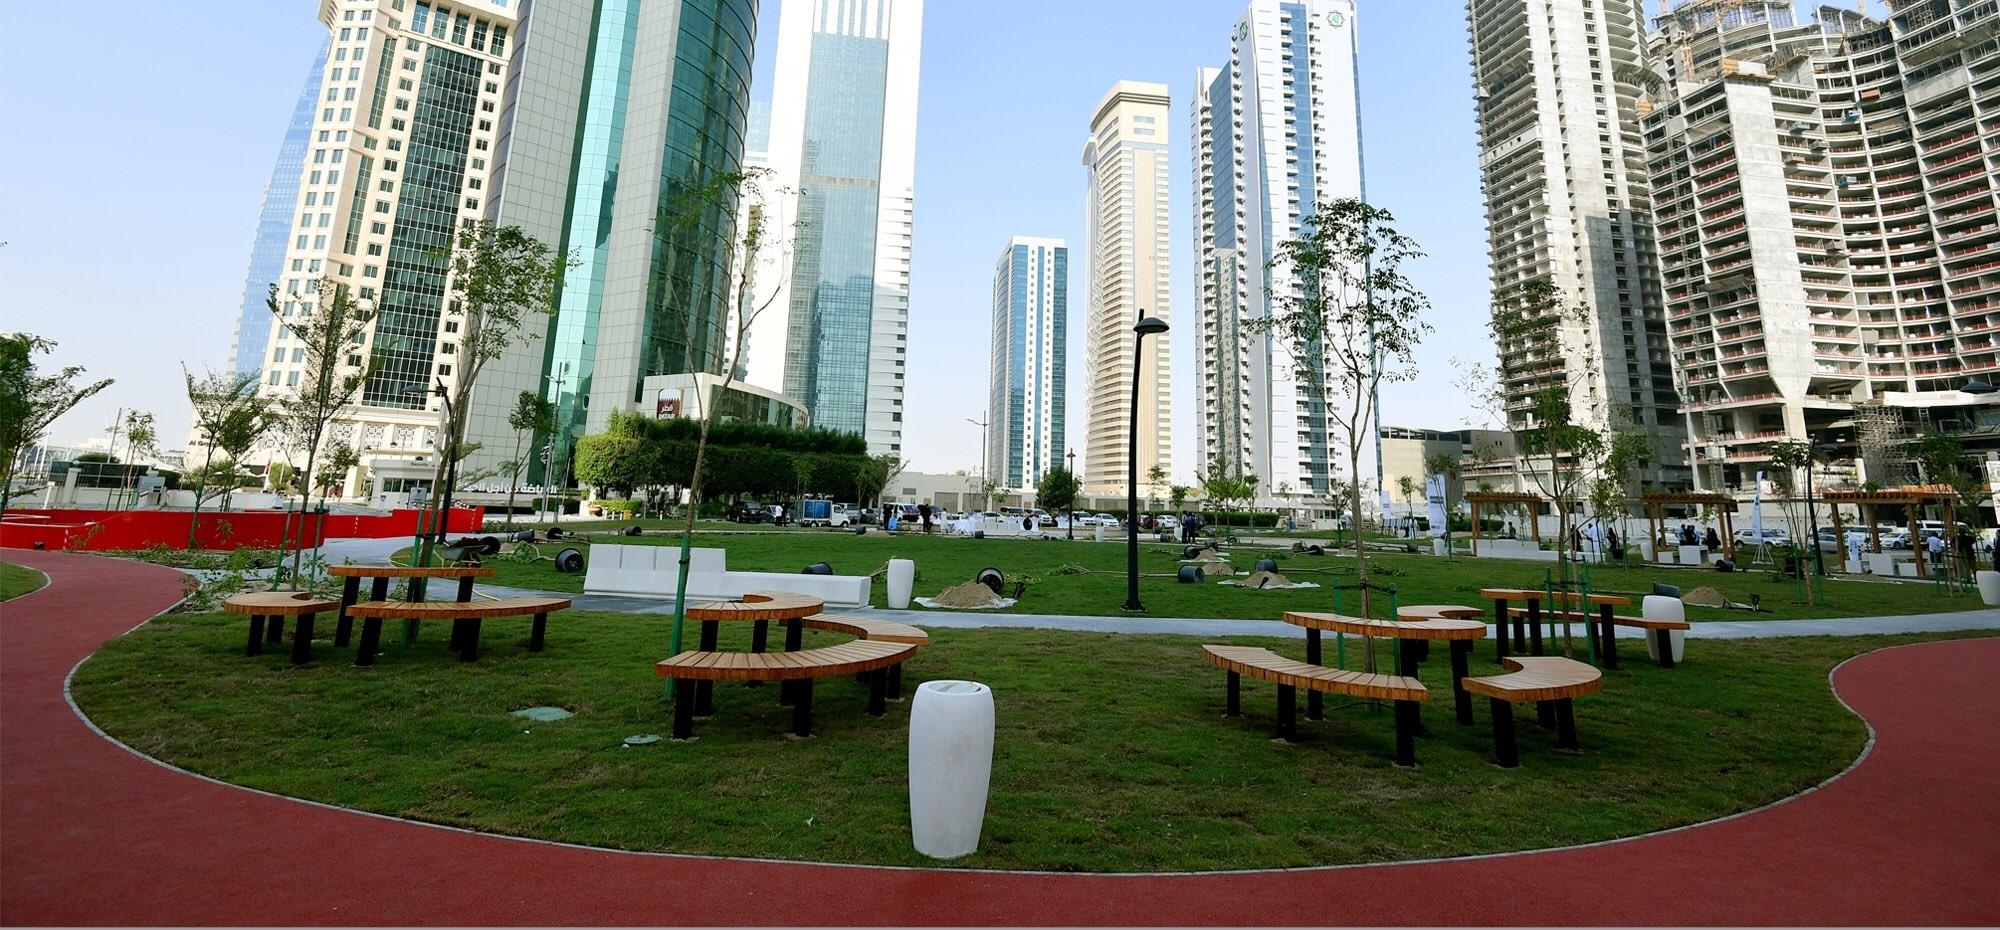 Al Abraj Park opened for the public at West Bay (Onaiza) area - QatarIndians.com